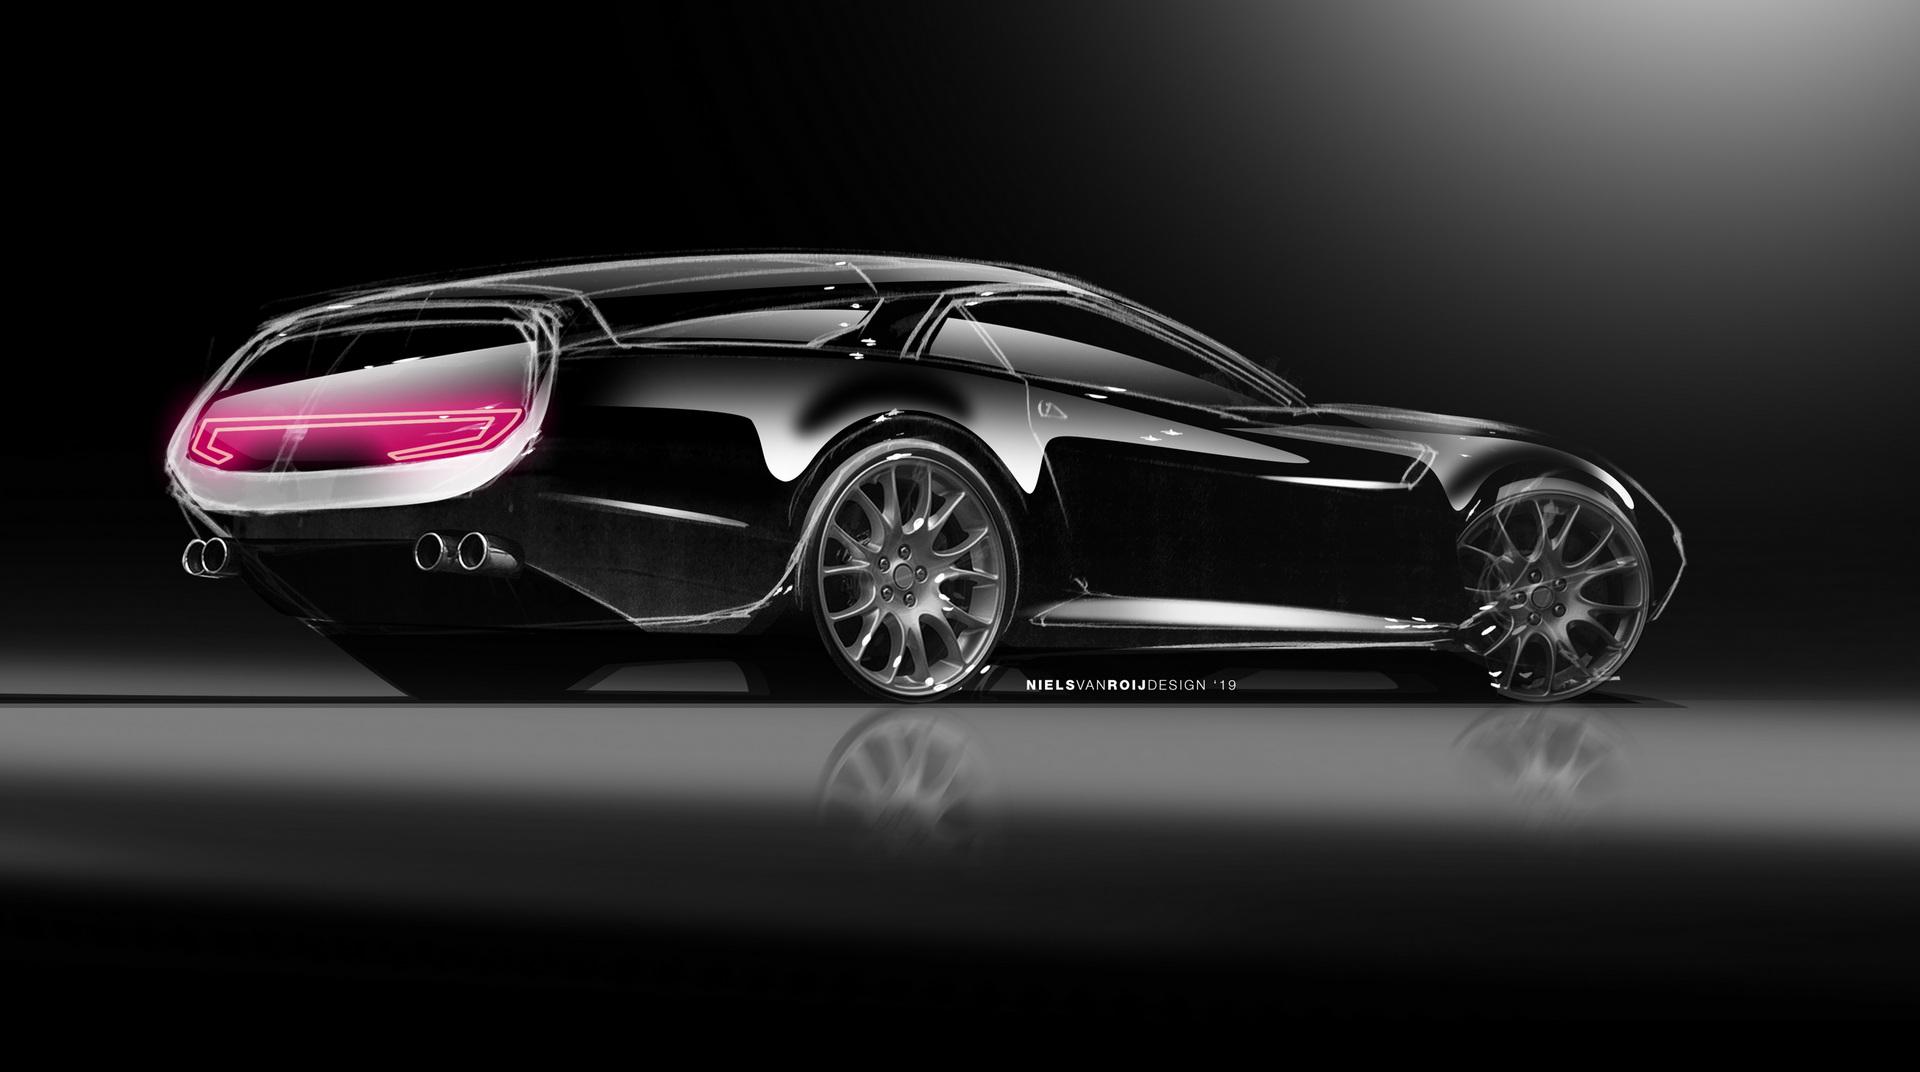 Ferrari-Daytona-Shooting-Brake-Hommage-by-Niels-van-Roij-Design-3